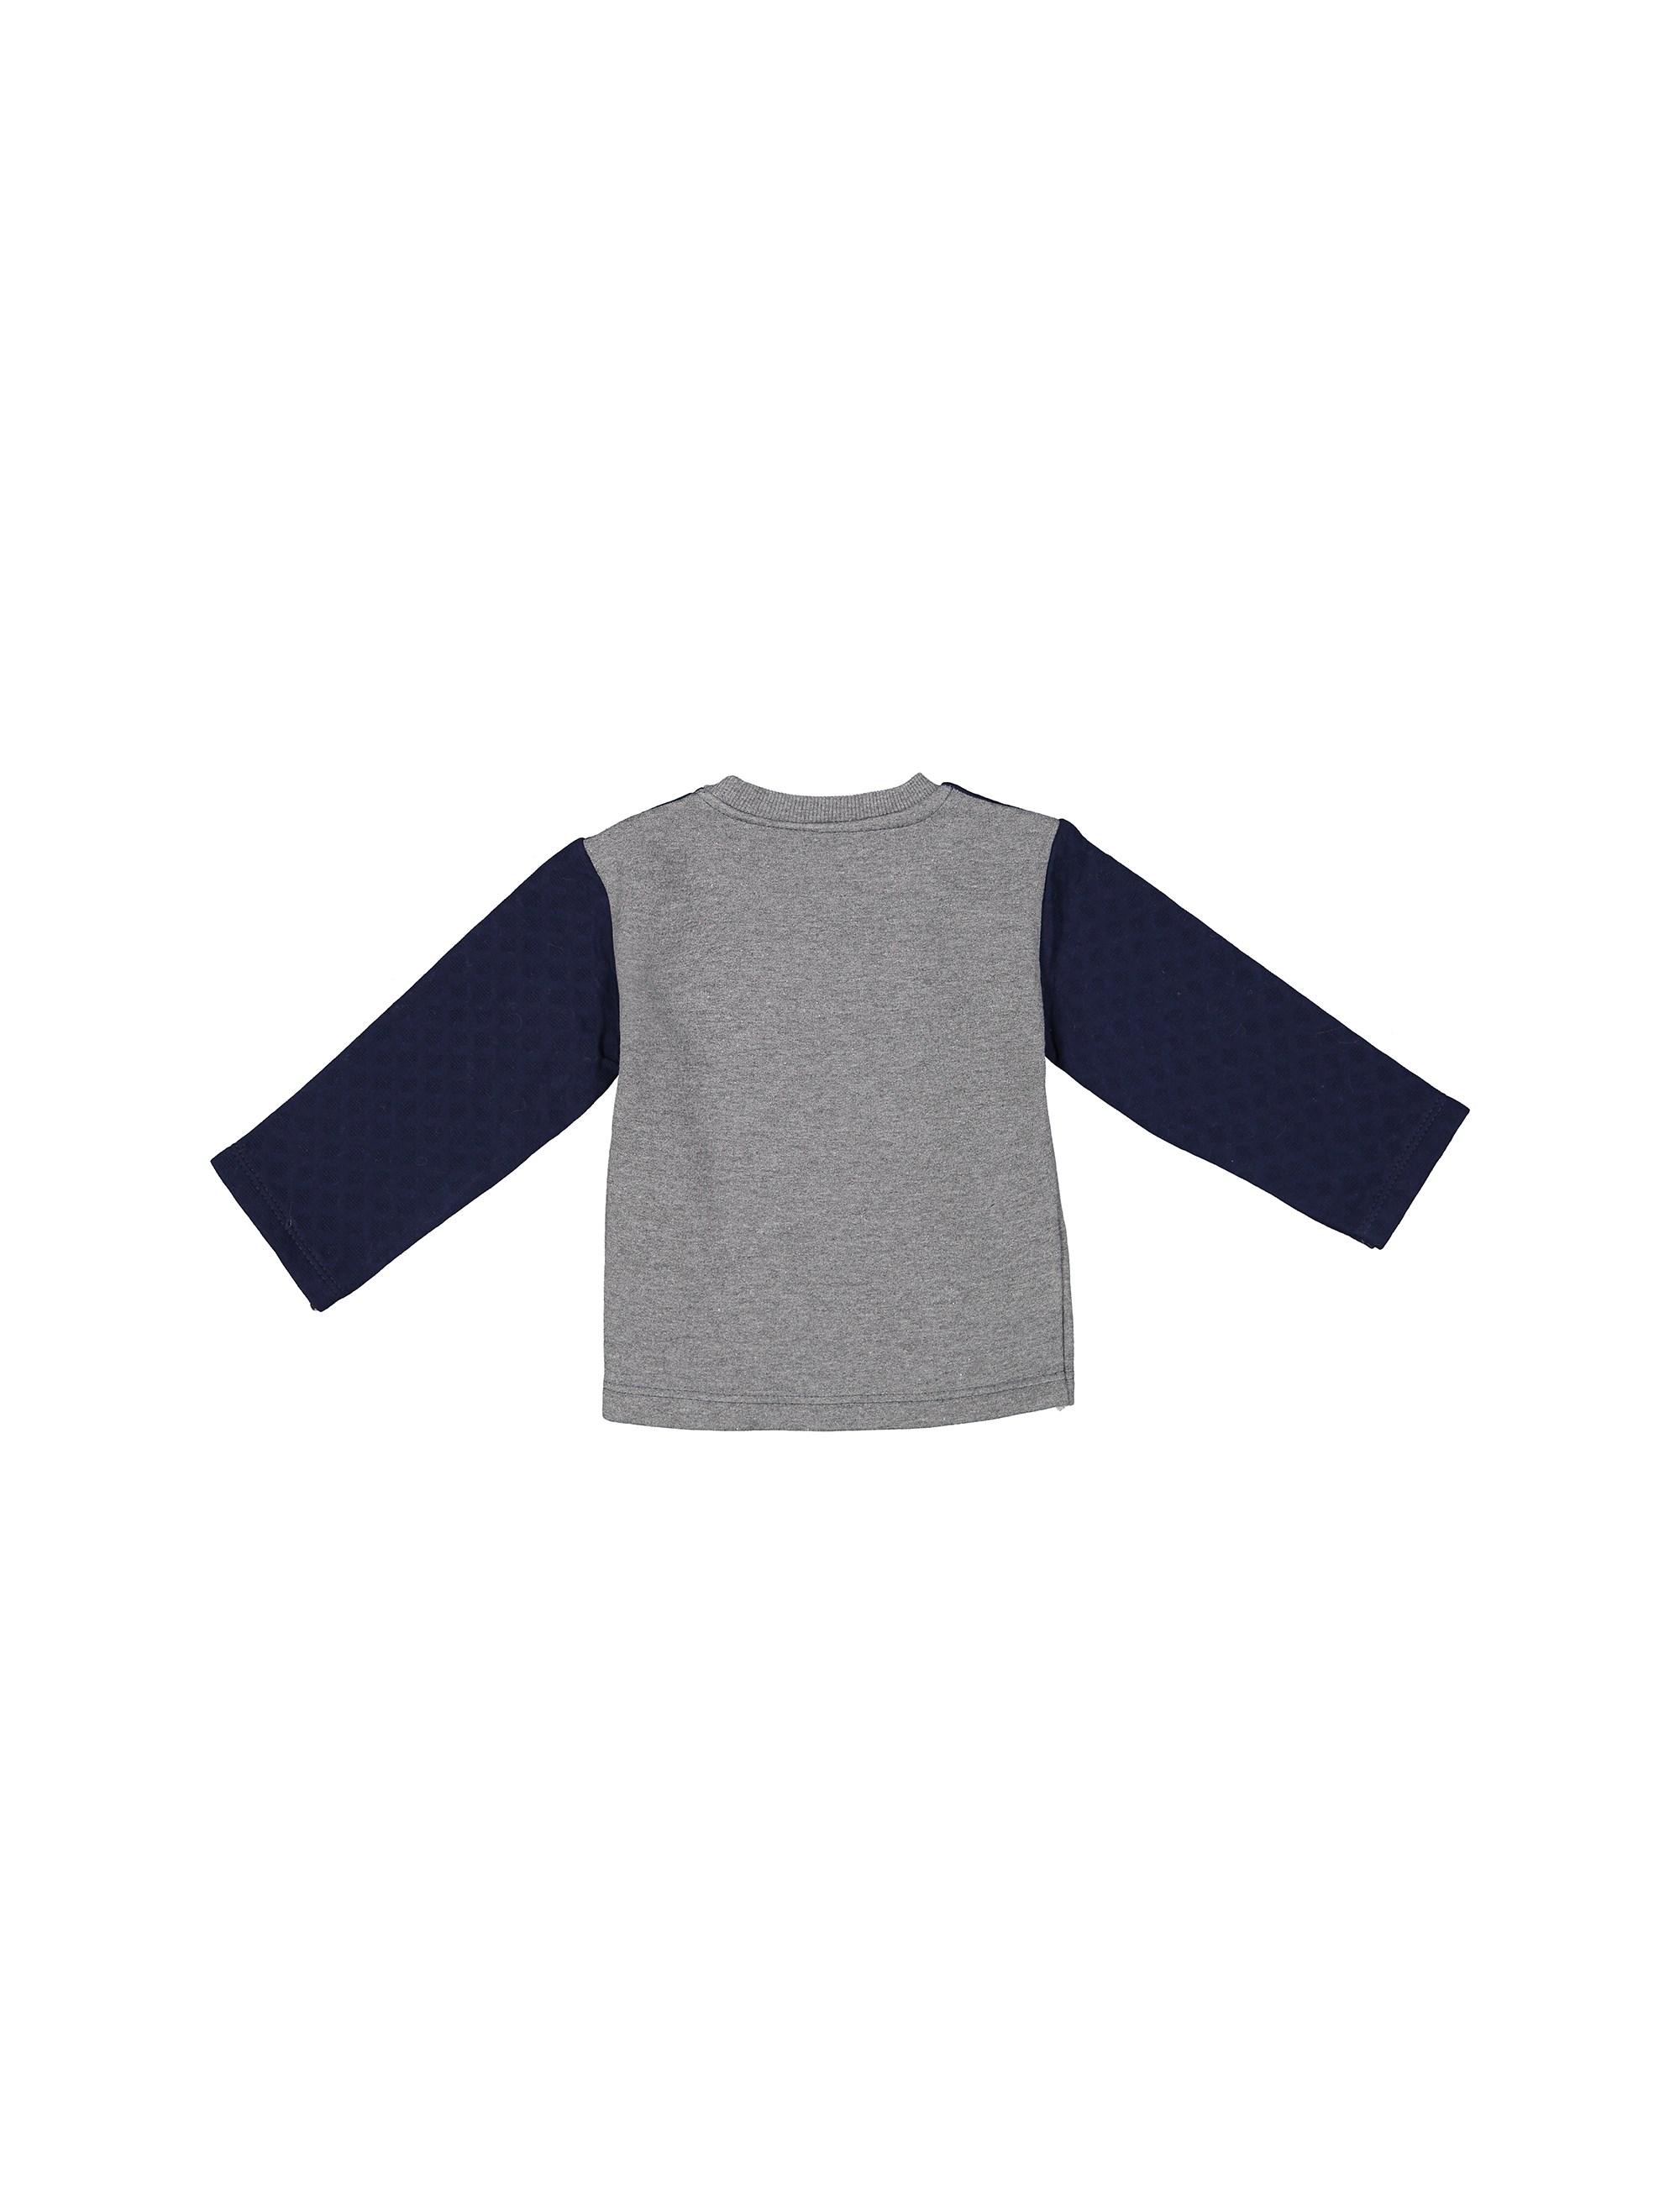 تی شرت نخی آستین بلند پسرانه - سون پون